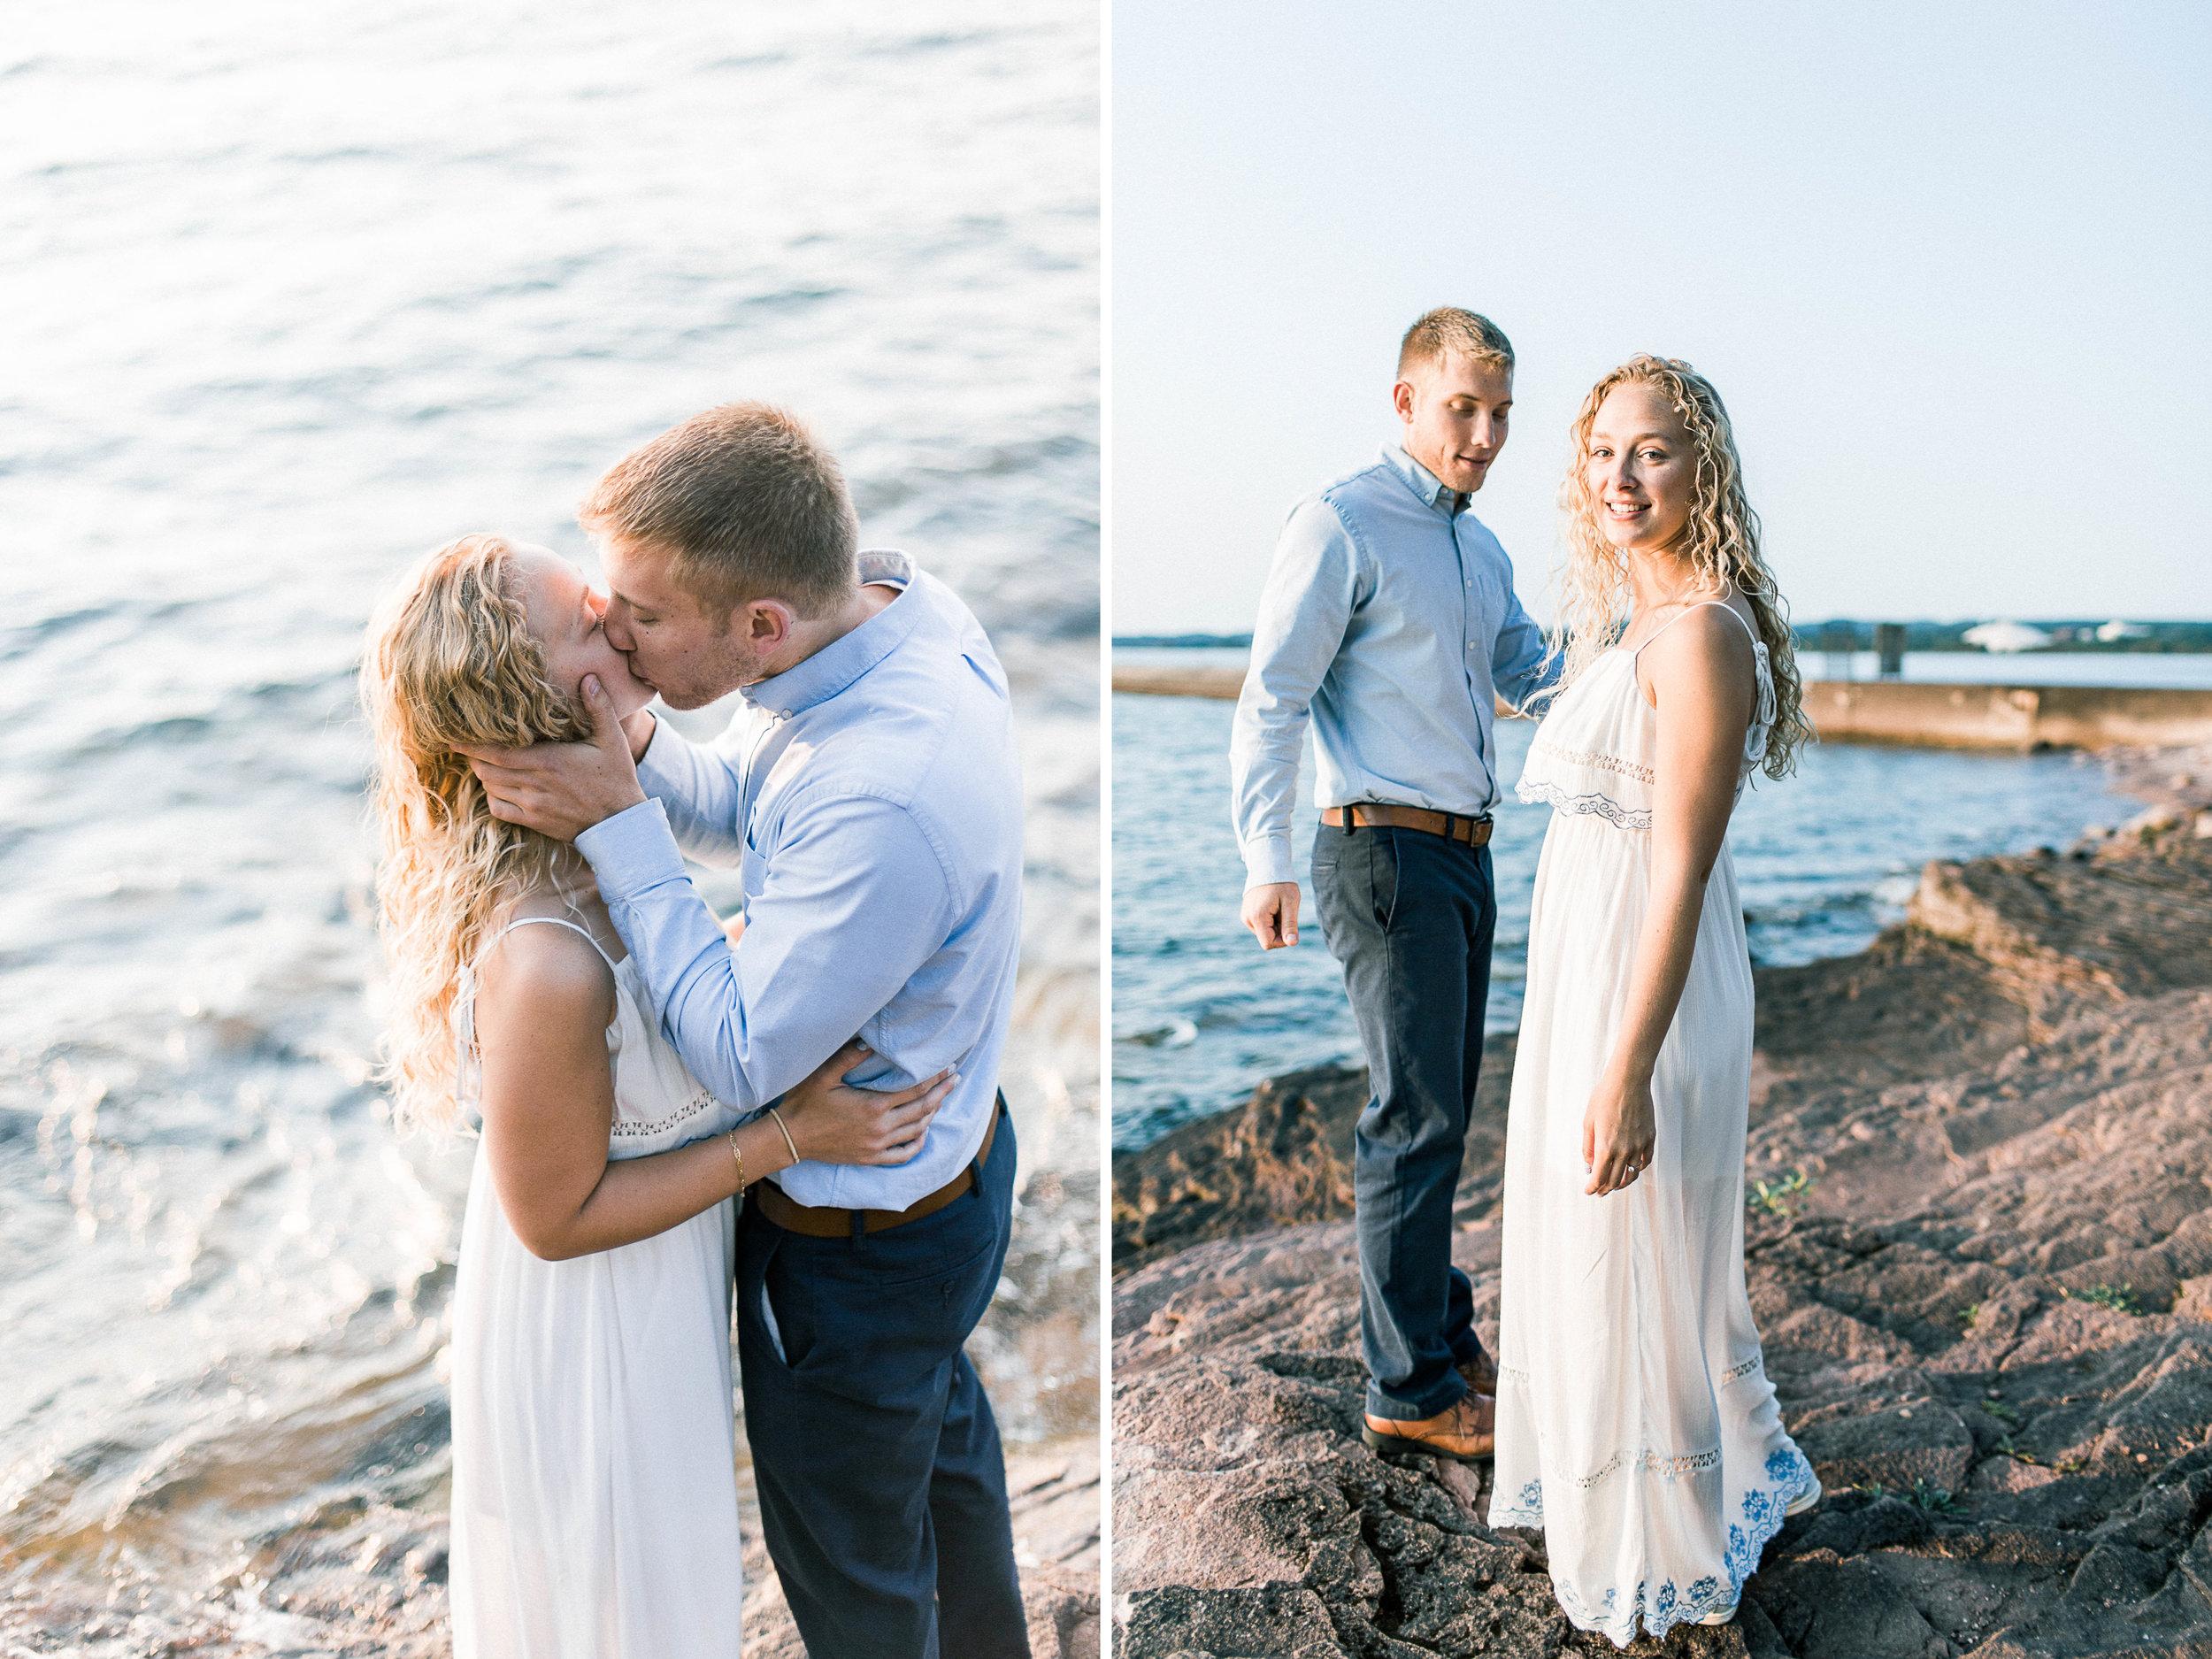 Northern Michigan Engagement Photographer - Lauren and Brent 005.jpg